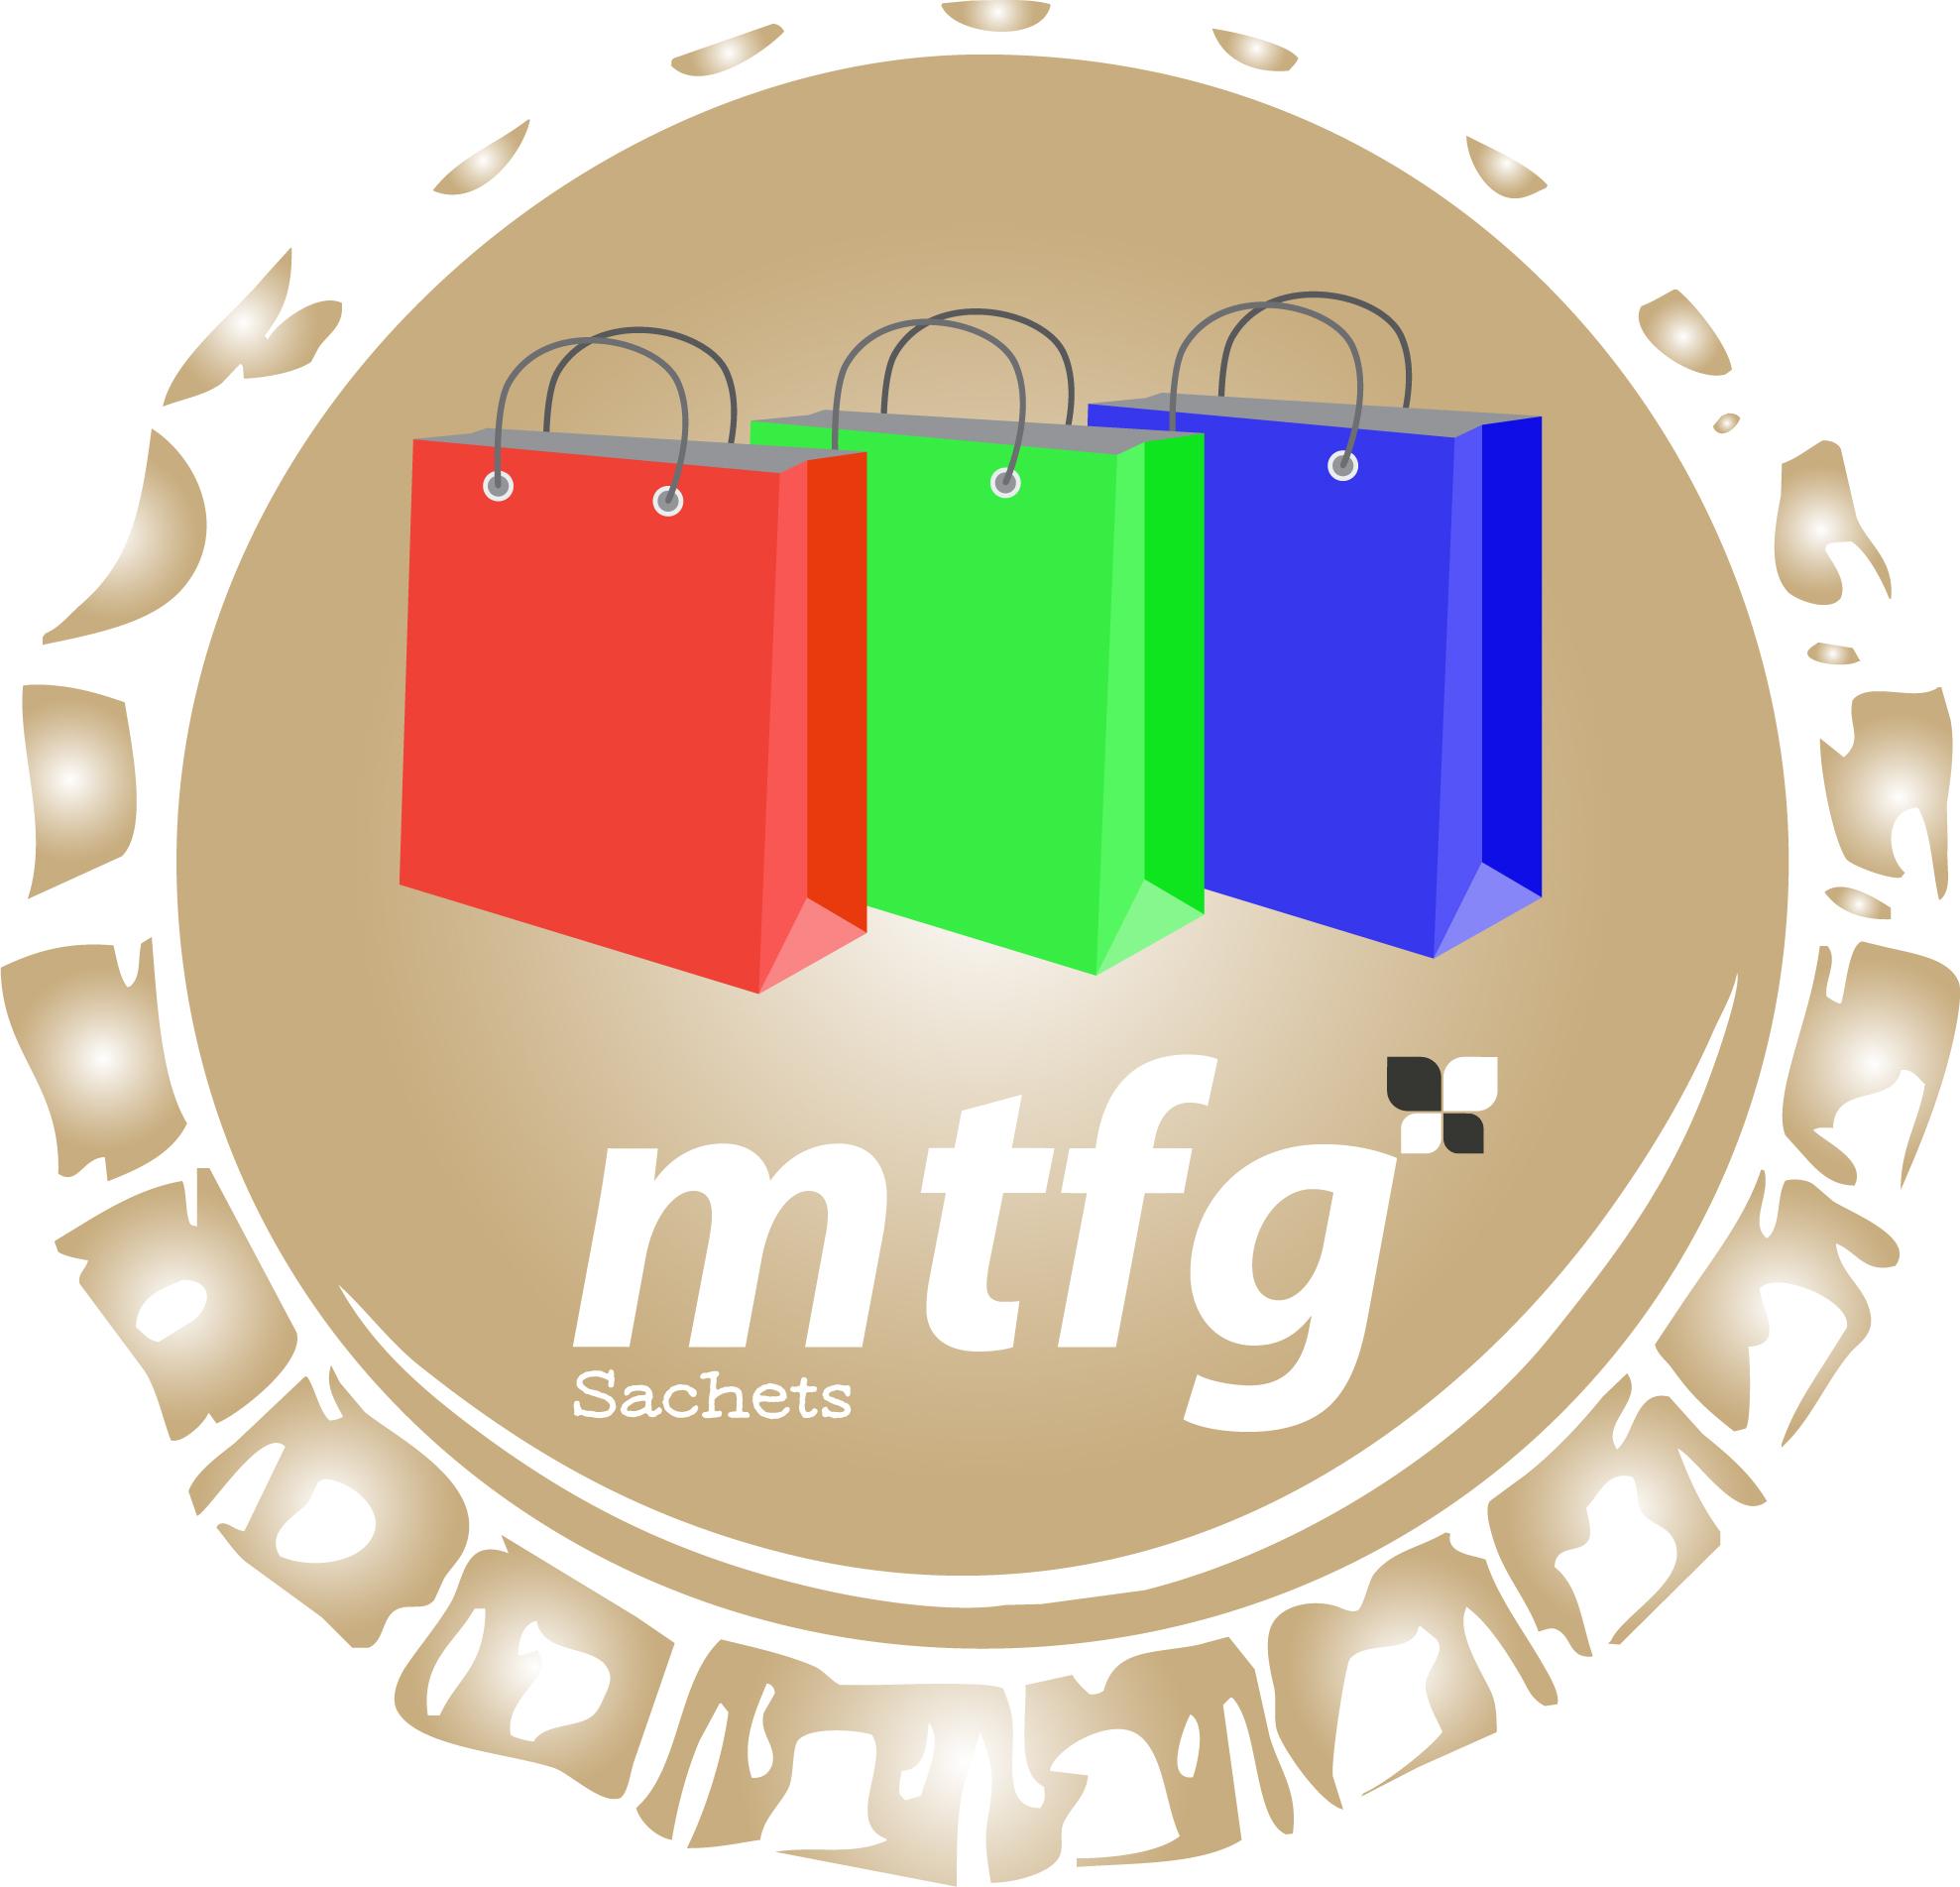 MTFG Sachets